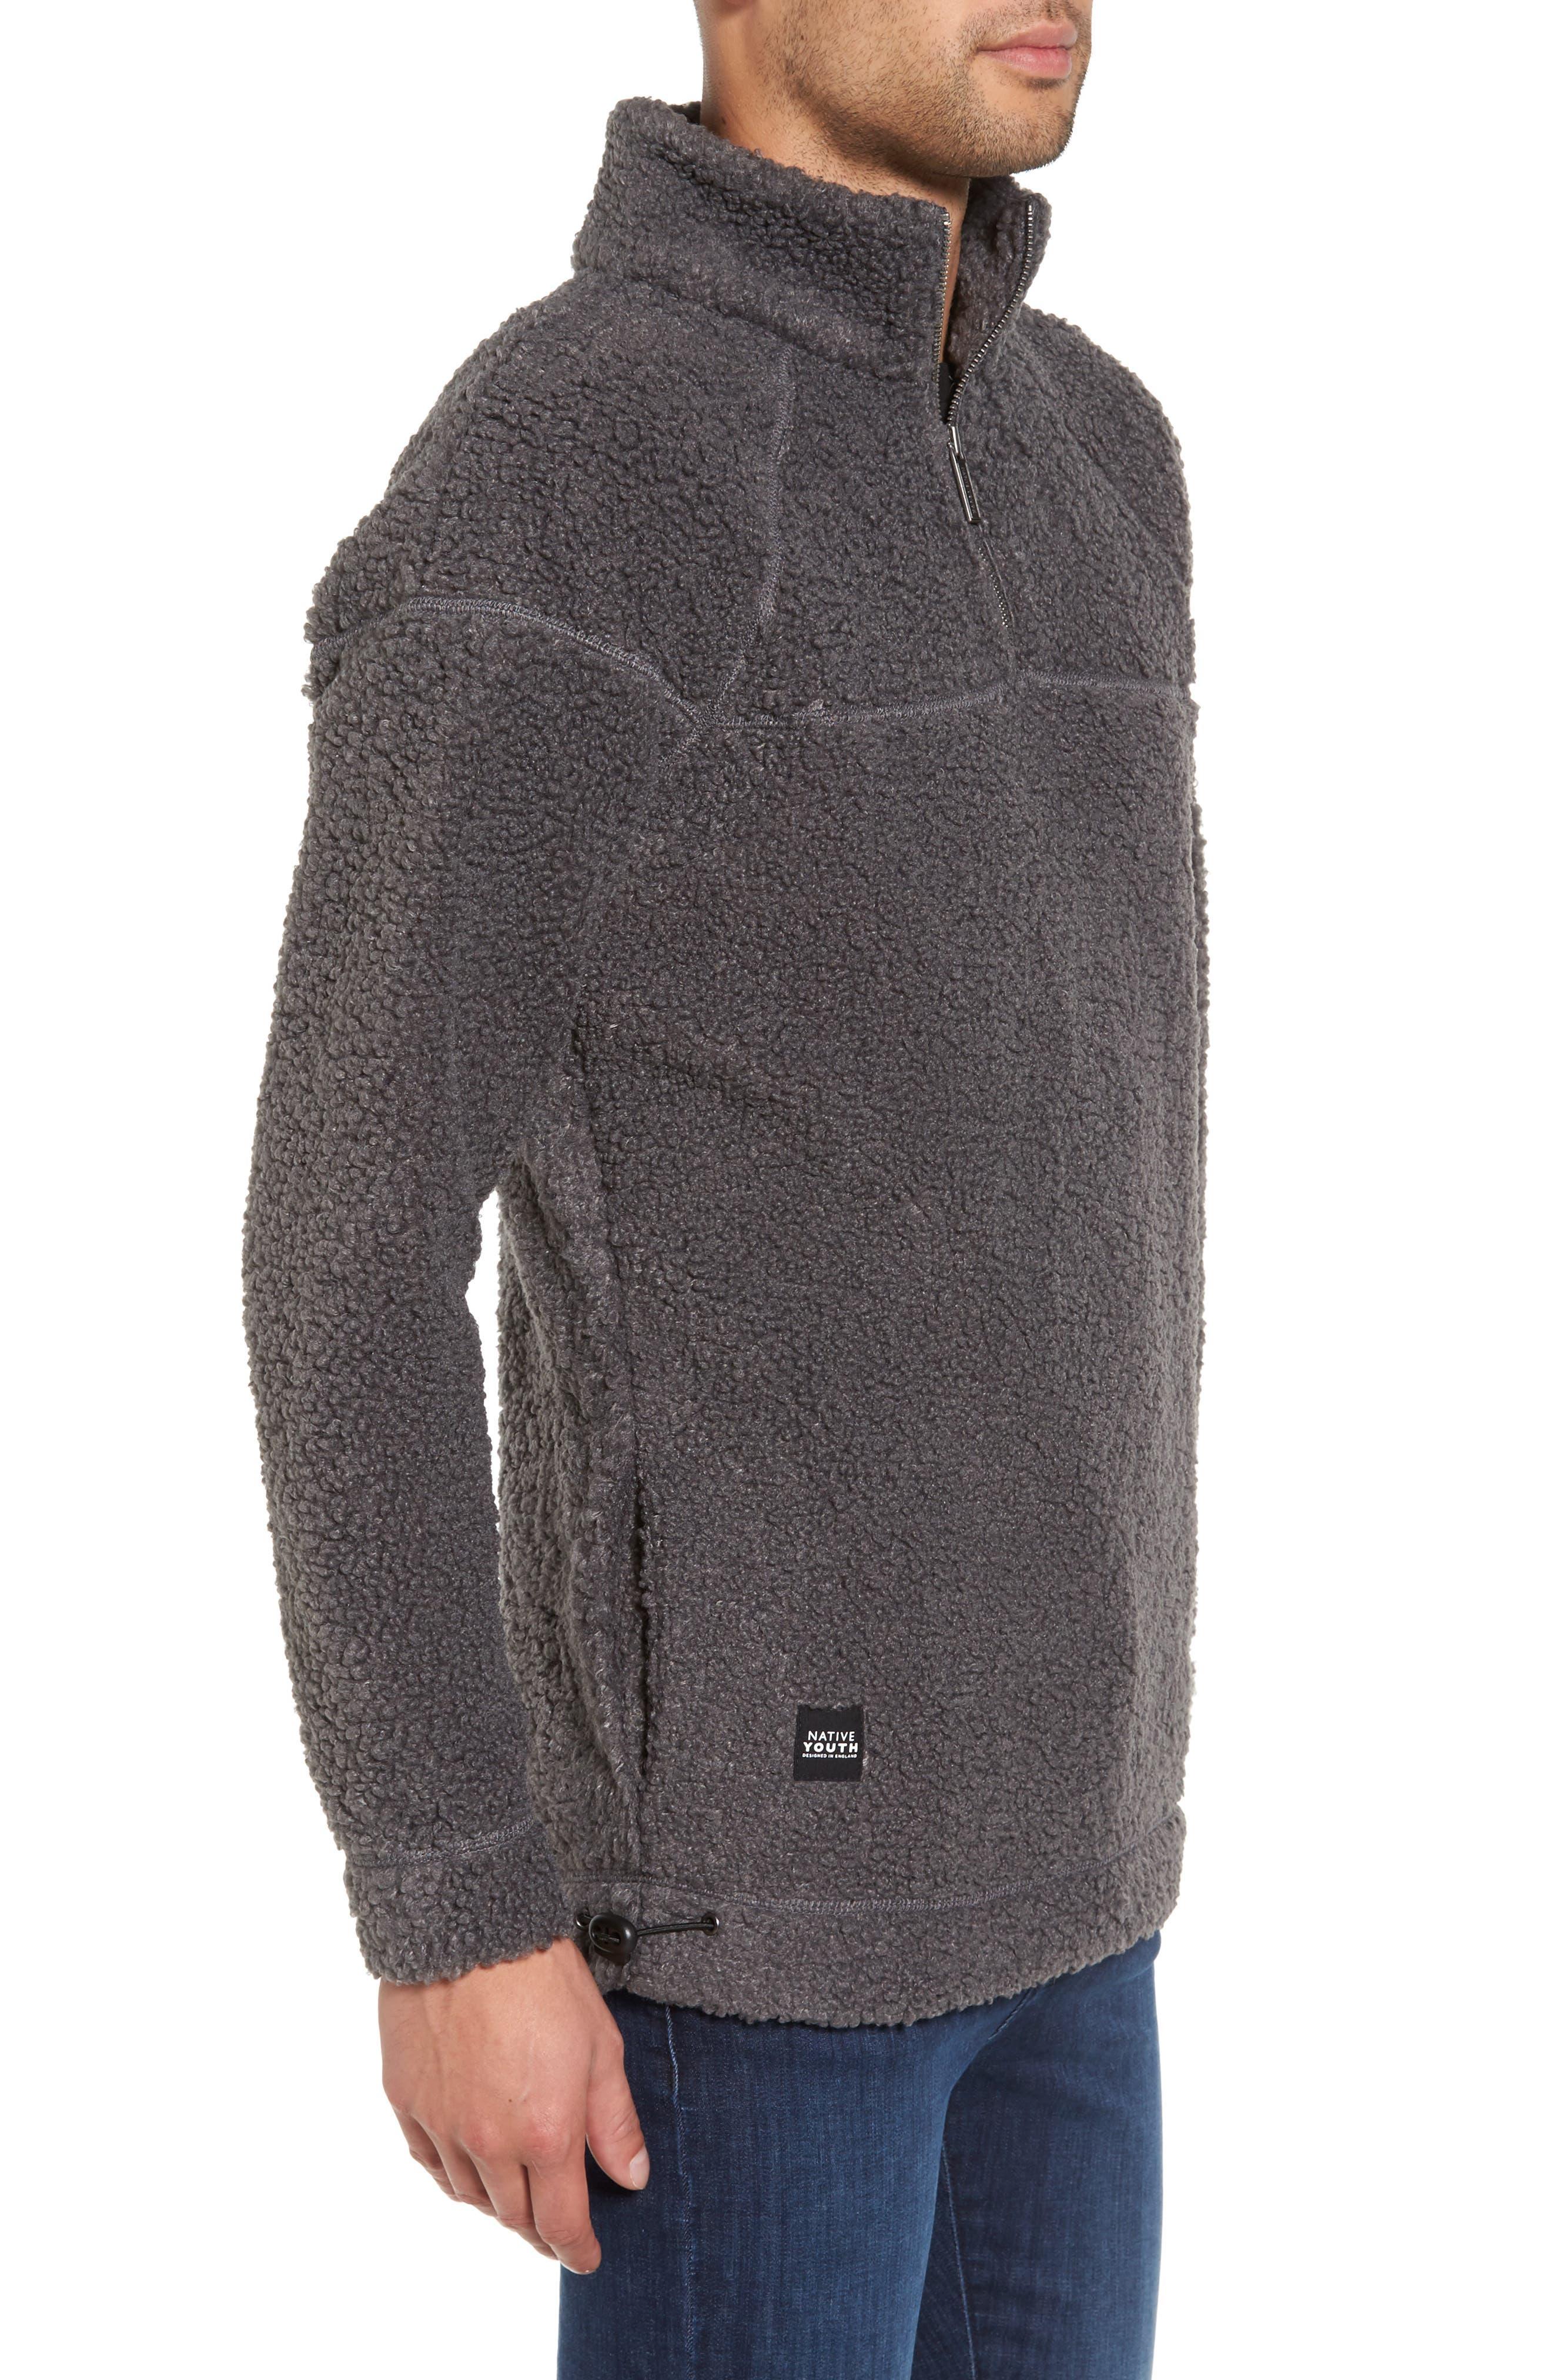 Warlock Faux Shearling Quarter Zip Sweater,                             Alternate thumbnail 3, color,